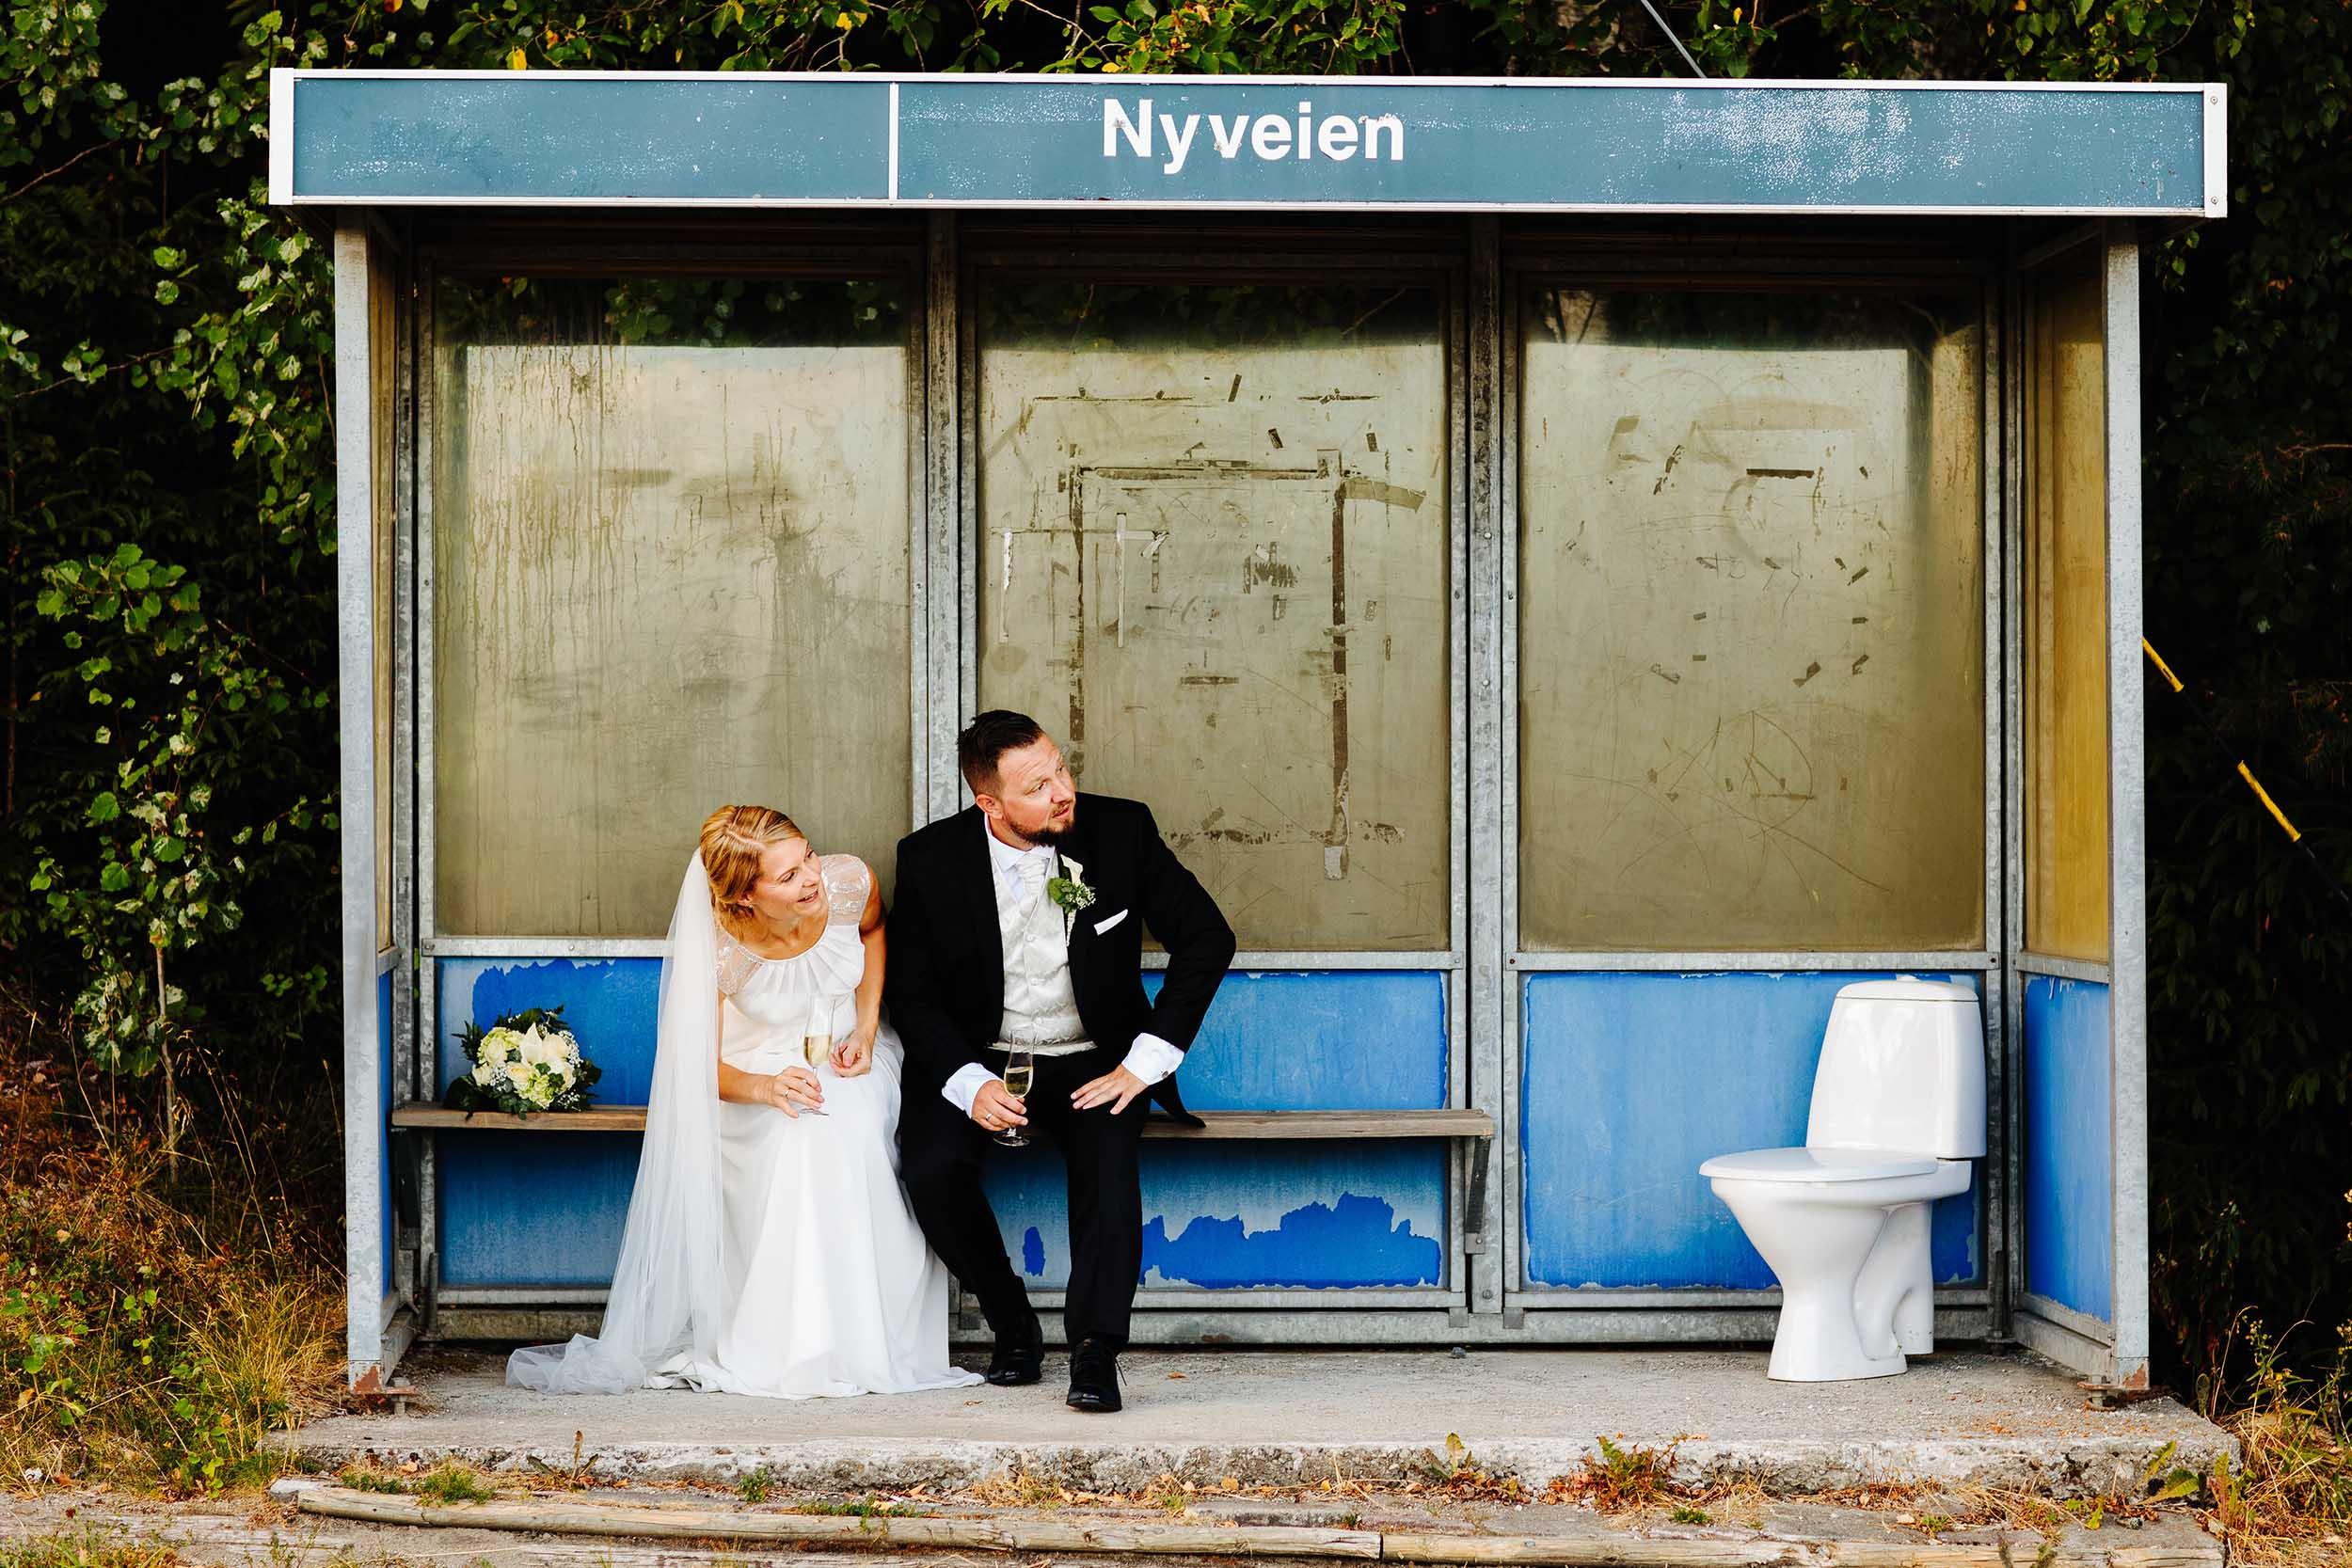 VIKfoto-Bryllup-Trine-og-Atle-0428_W.jpg